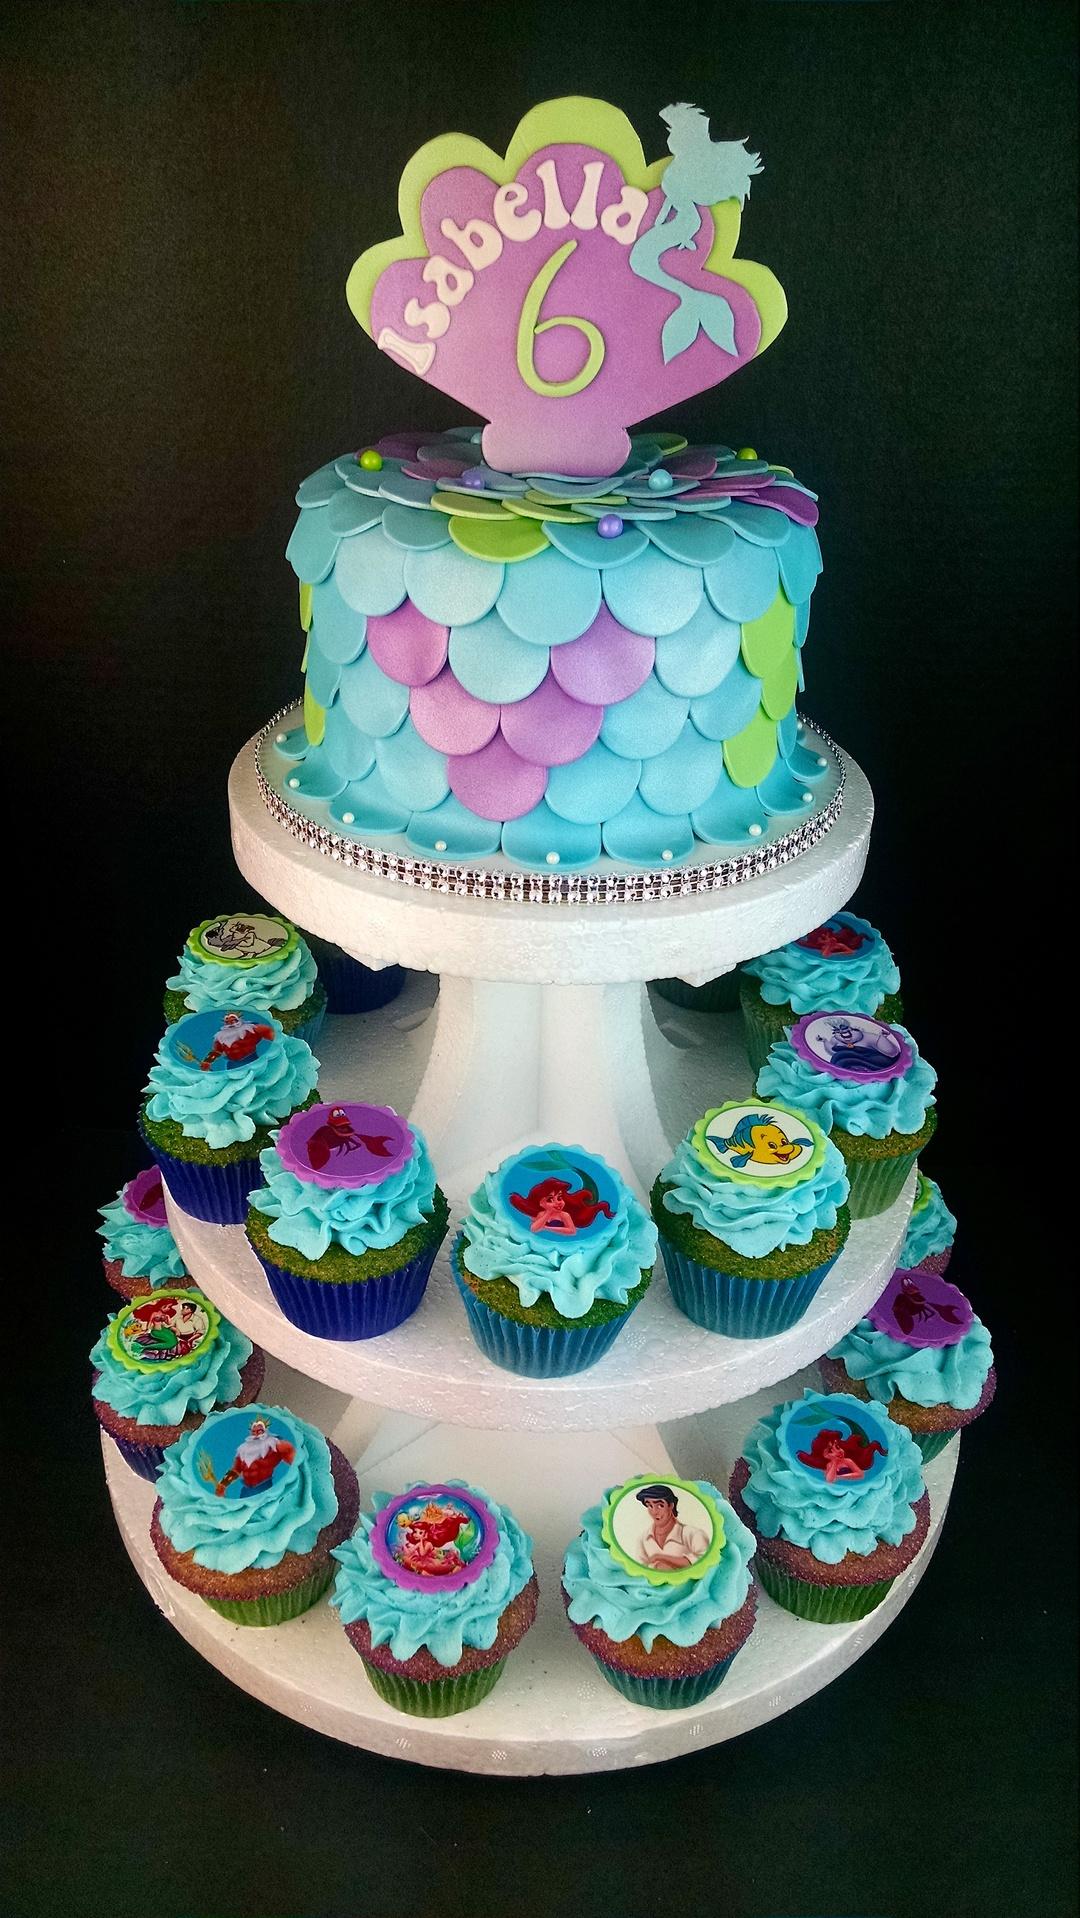 Isabella's Mermaid Cake & Cupcakes